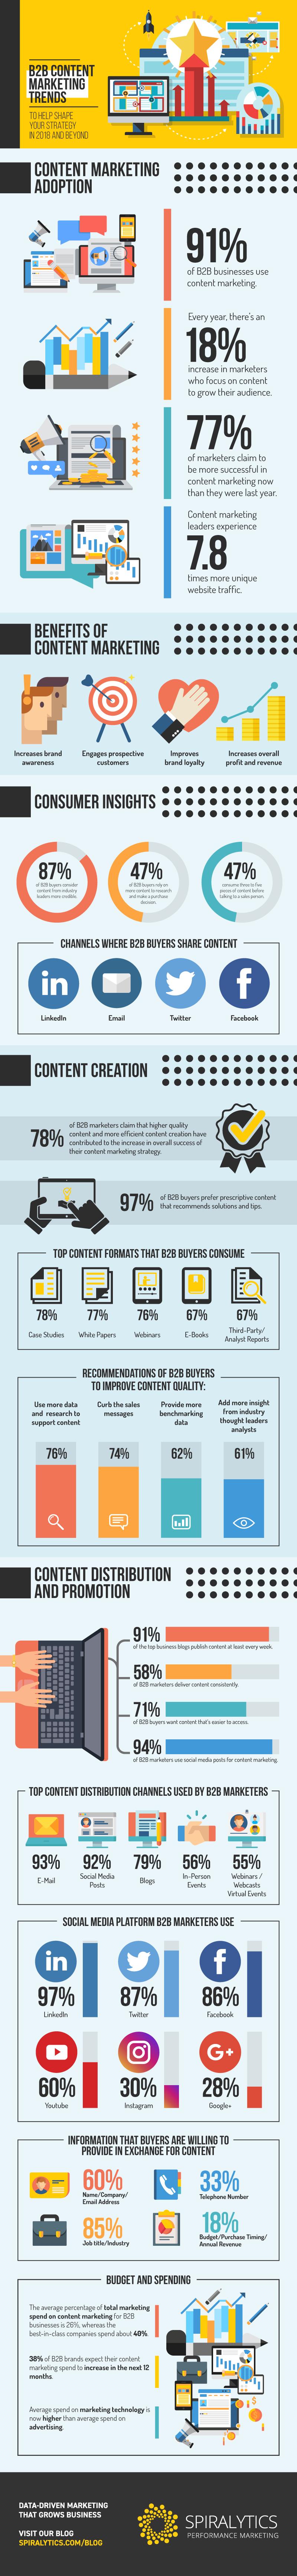 Spira-Infographic-B2B-Marketing-Trends-2018.png